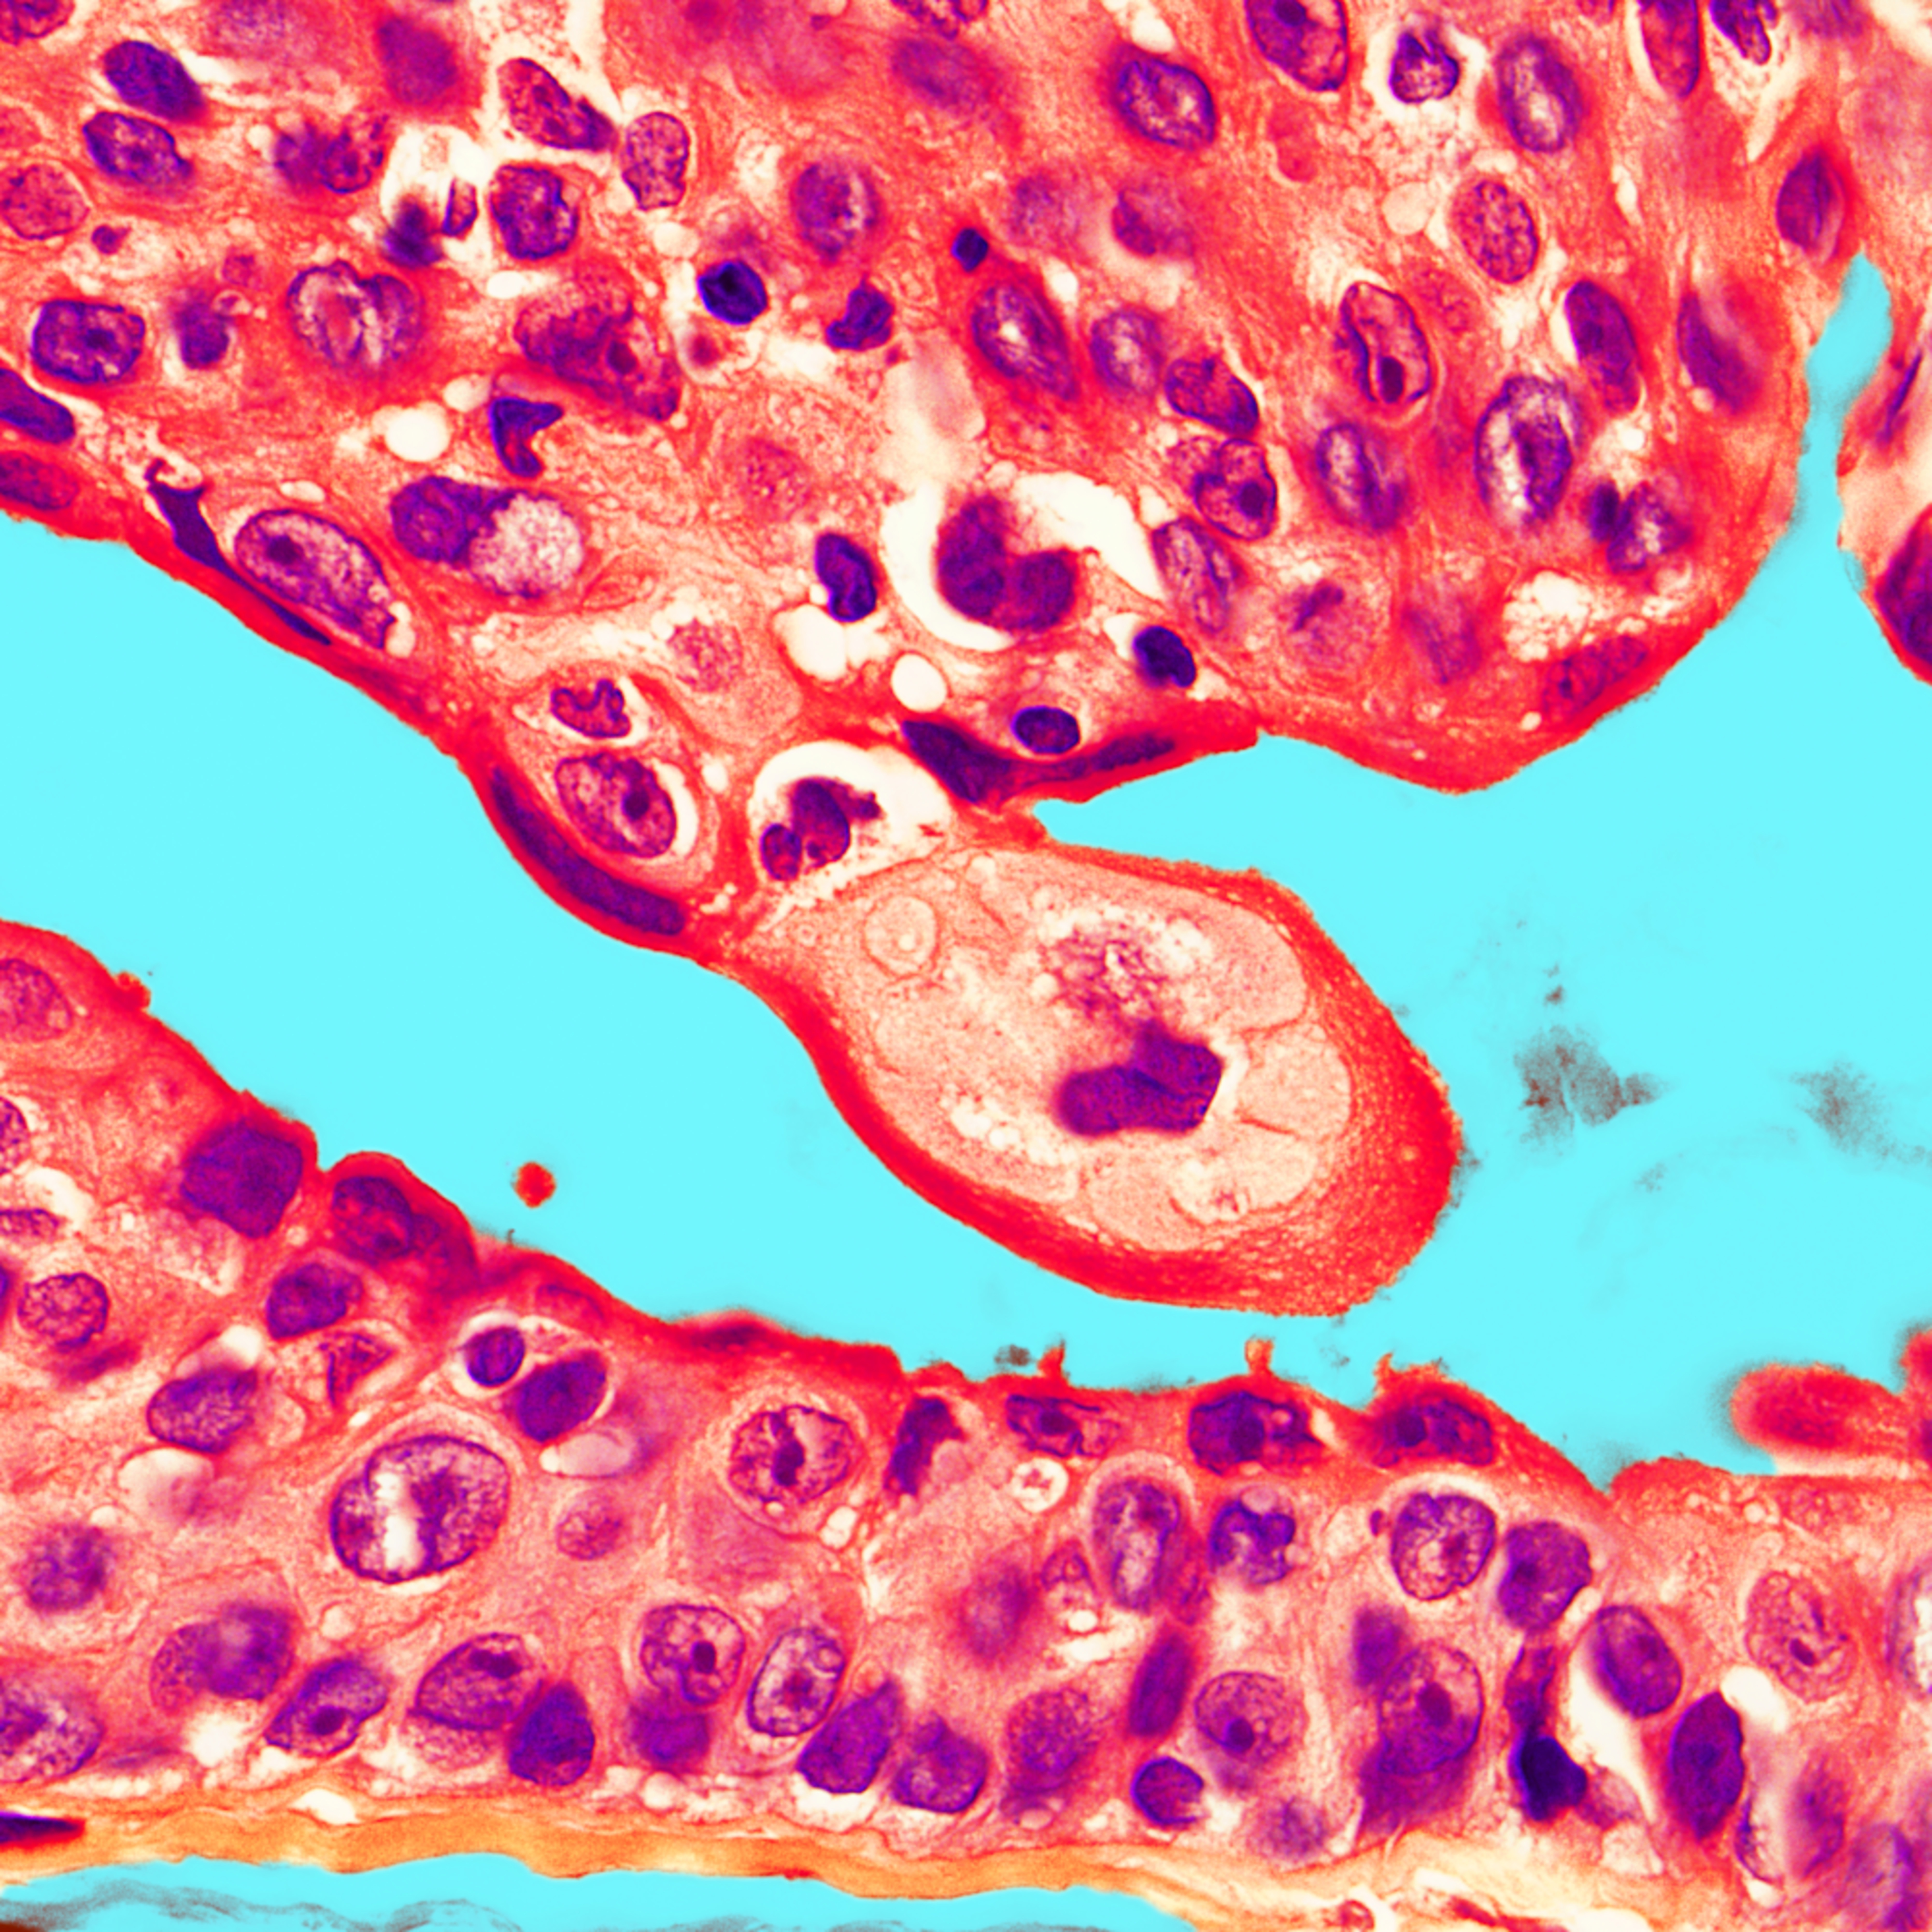 Skin clear cell hidradenoma 100x 2 vzmbim